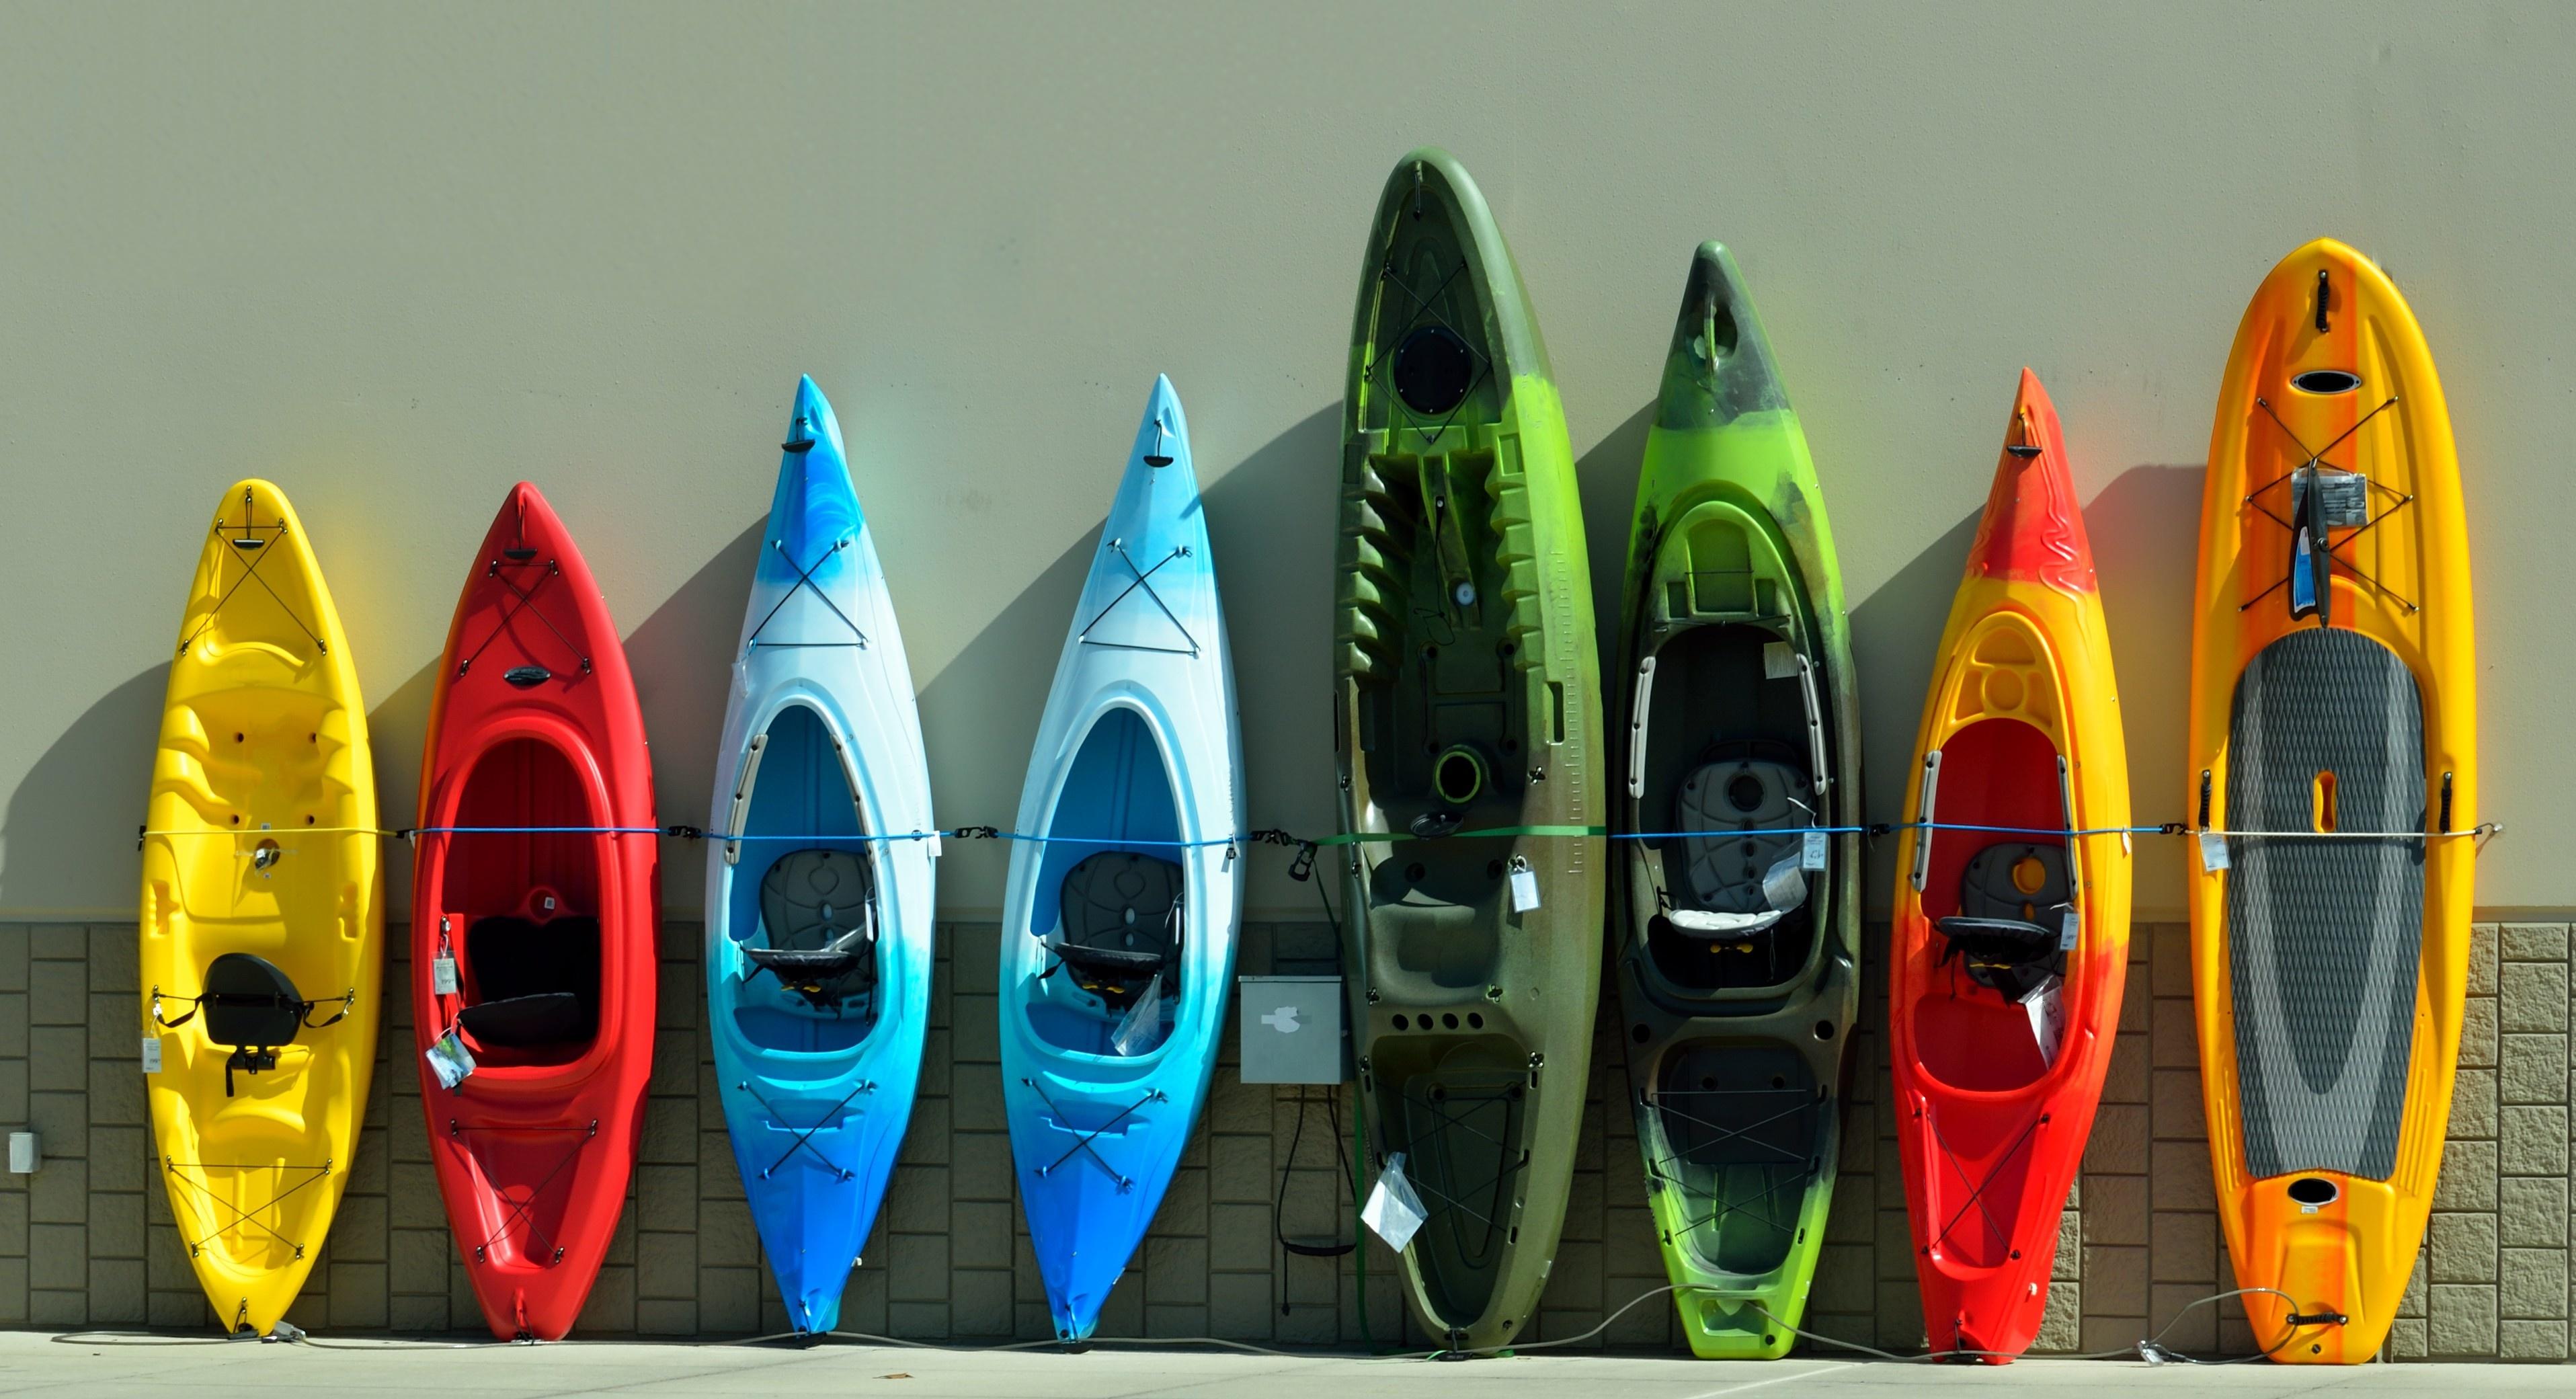 Kayak Self Storage, Personal Storage